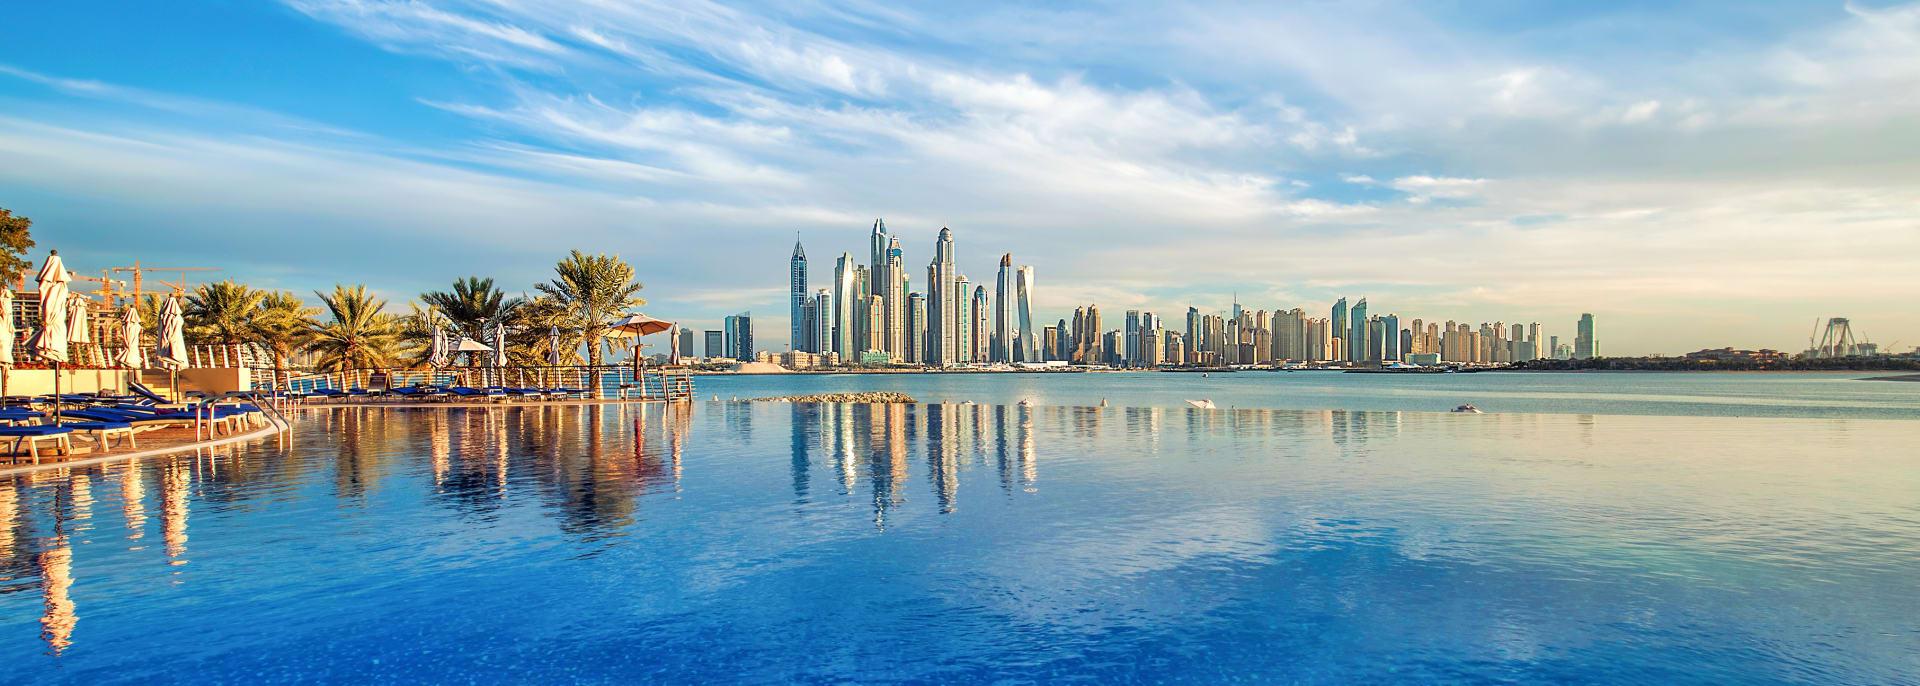 Swimmingpool, Dubai